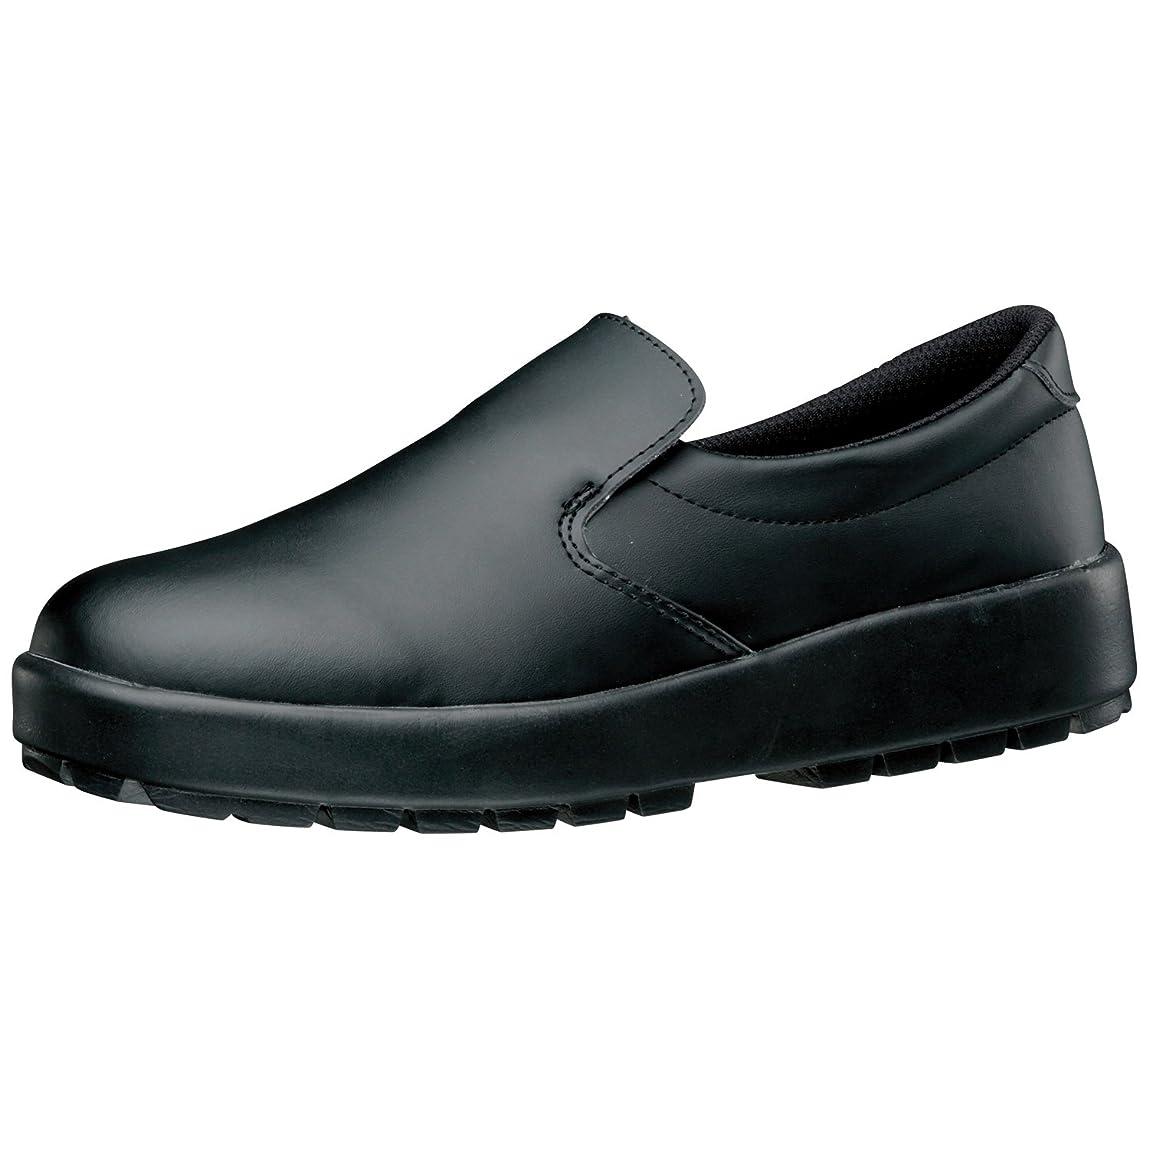 [ミドリ安全] 超耐滑軽量作業靴 短靴 HRS480N